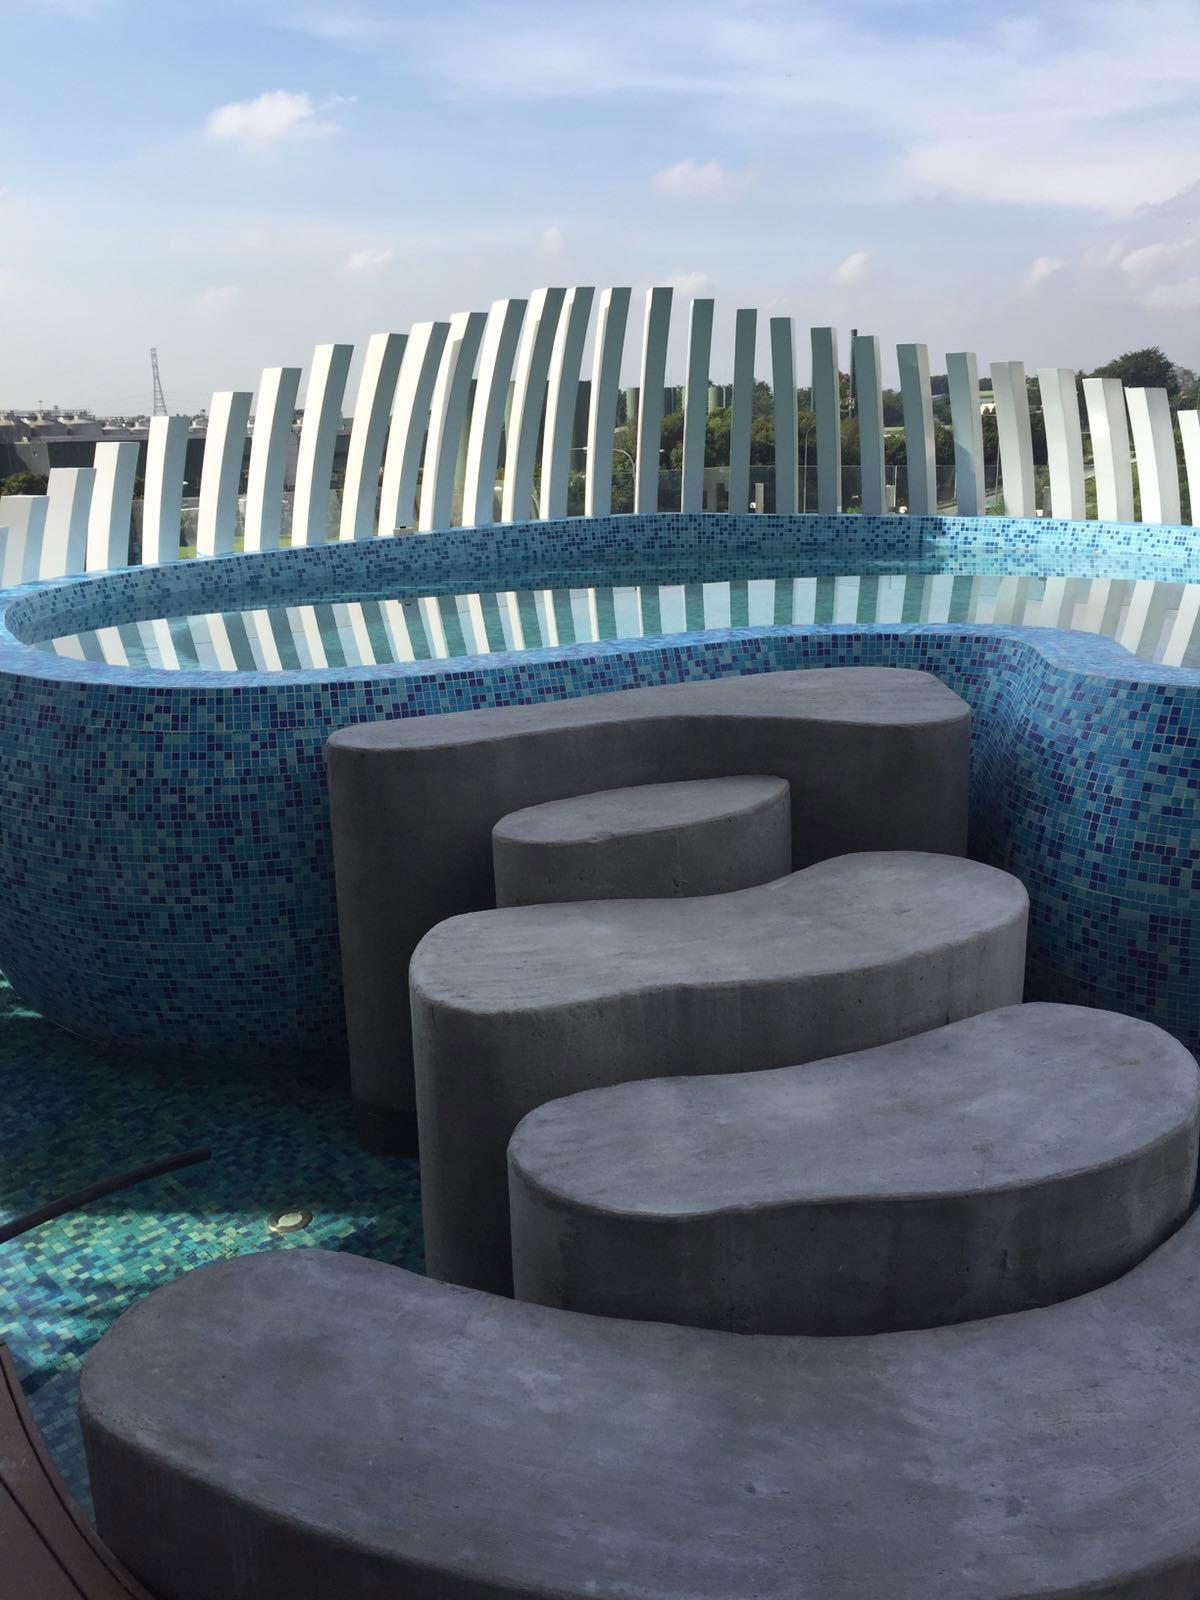 Swimming Pool Pathway